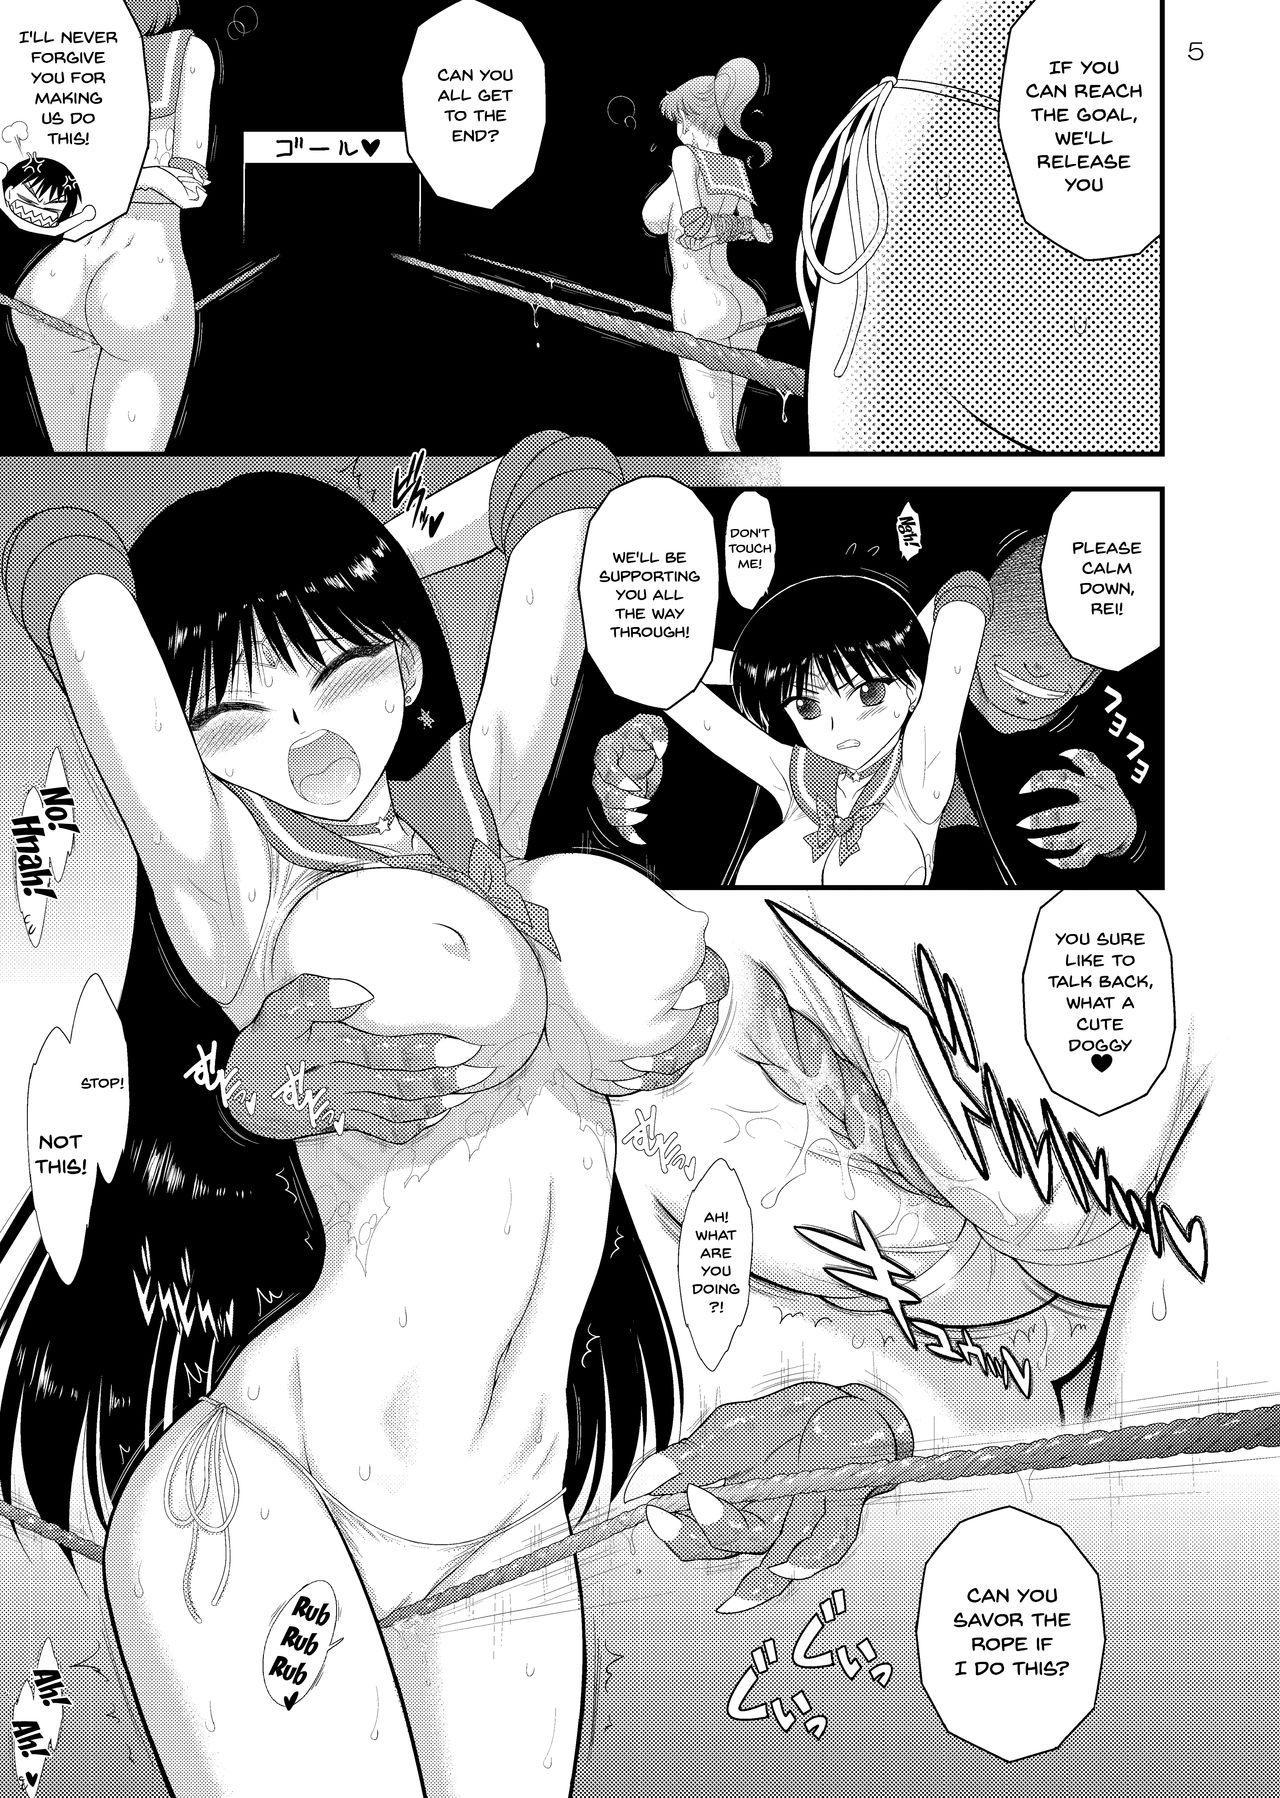 Bisoku Zenshin | Flirtation Sped Forward 3